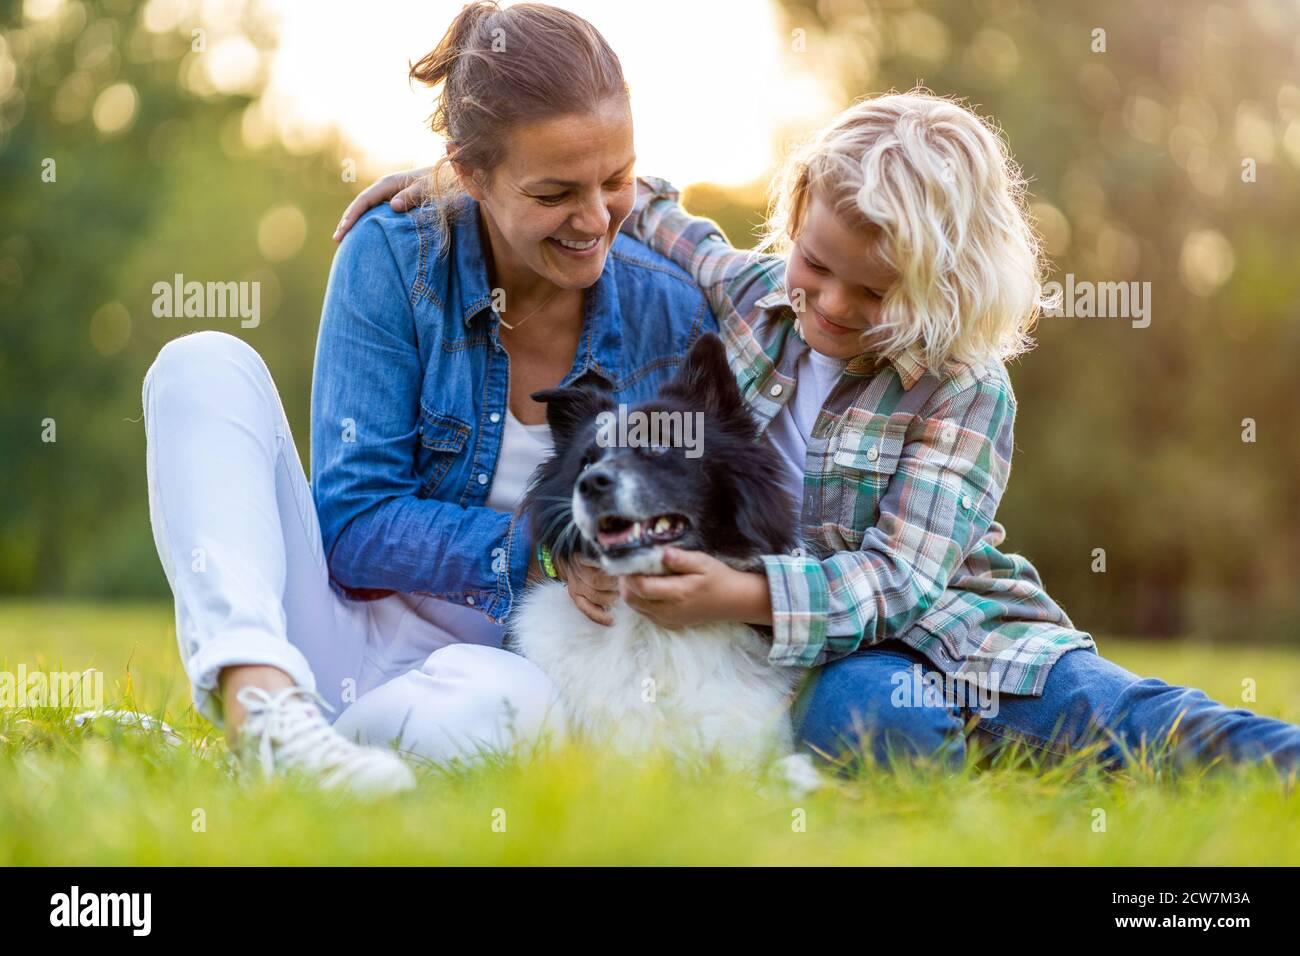 Feliz madre e hijo al aire libre acariciando a su perro Foto de stock